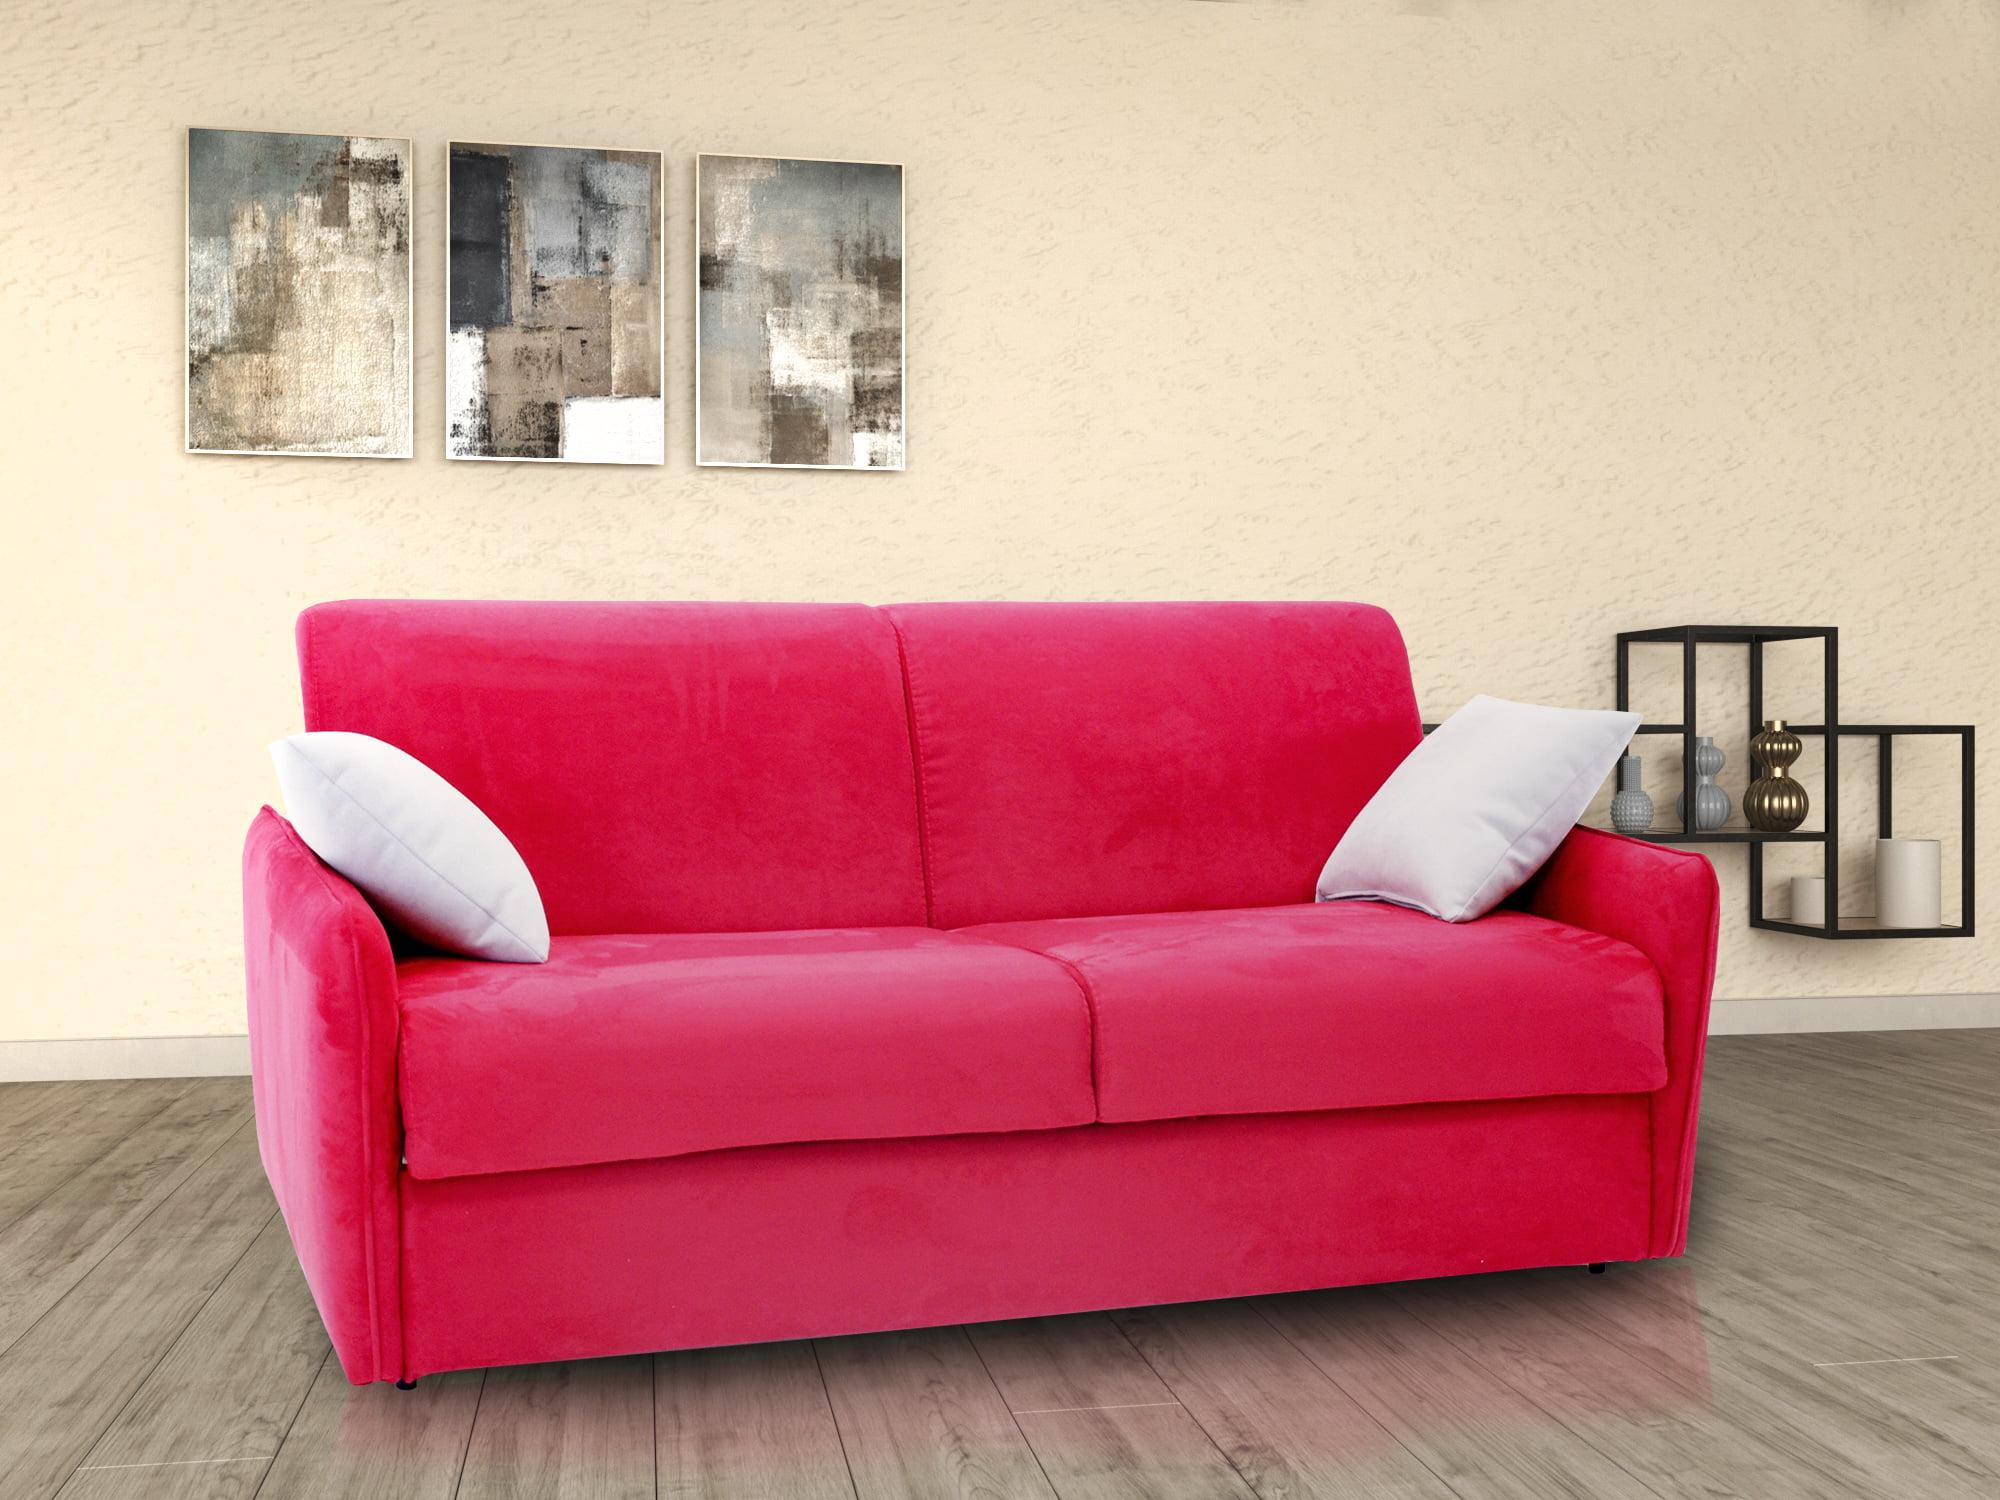 MARGHERITA sofa giotto living sofa relax sofa ange sofa sofabed corner sofa